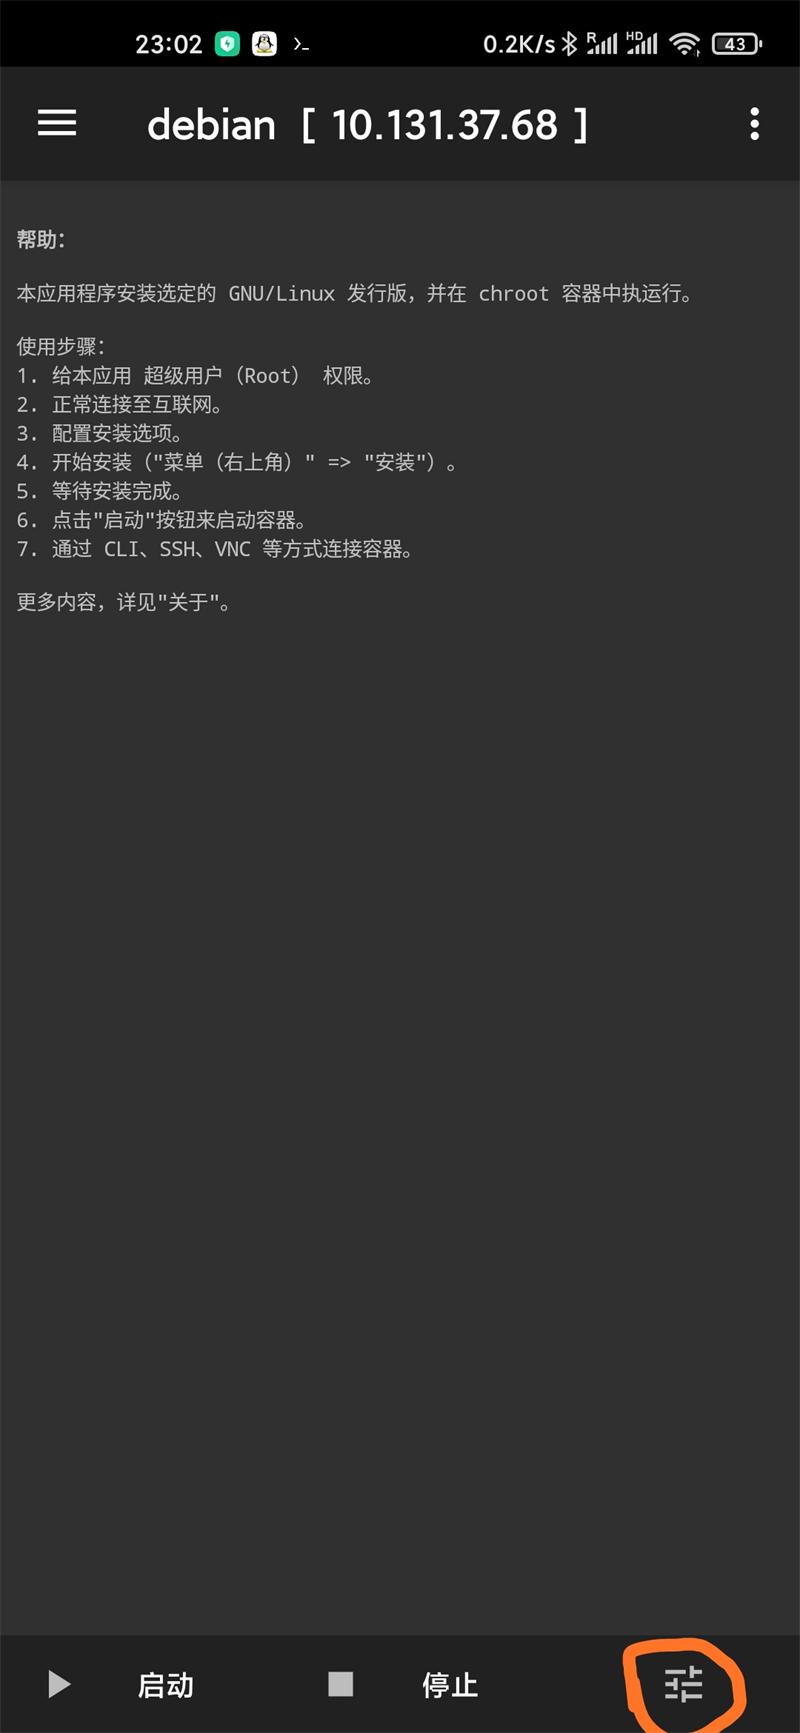 file-hash-png-070d4474caf22d91965ff96cc5b36370251981.png